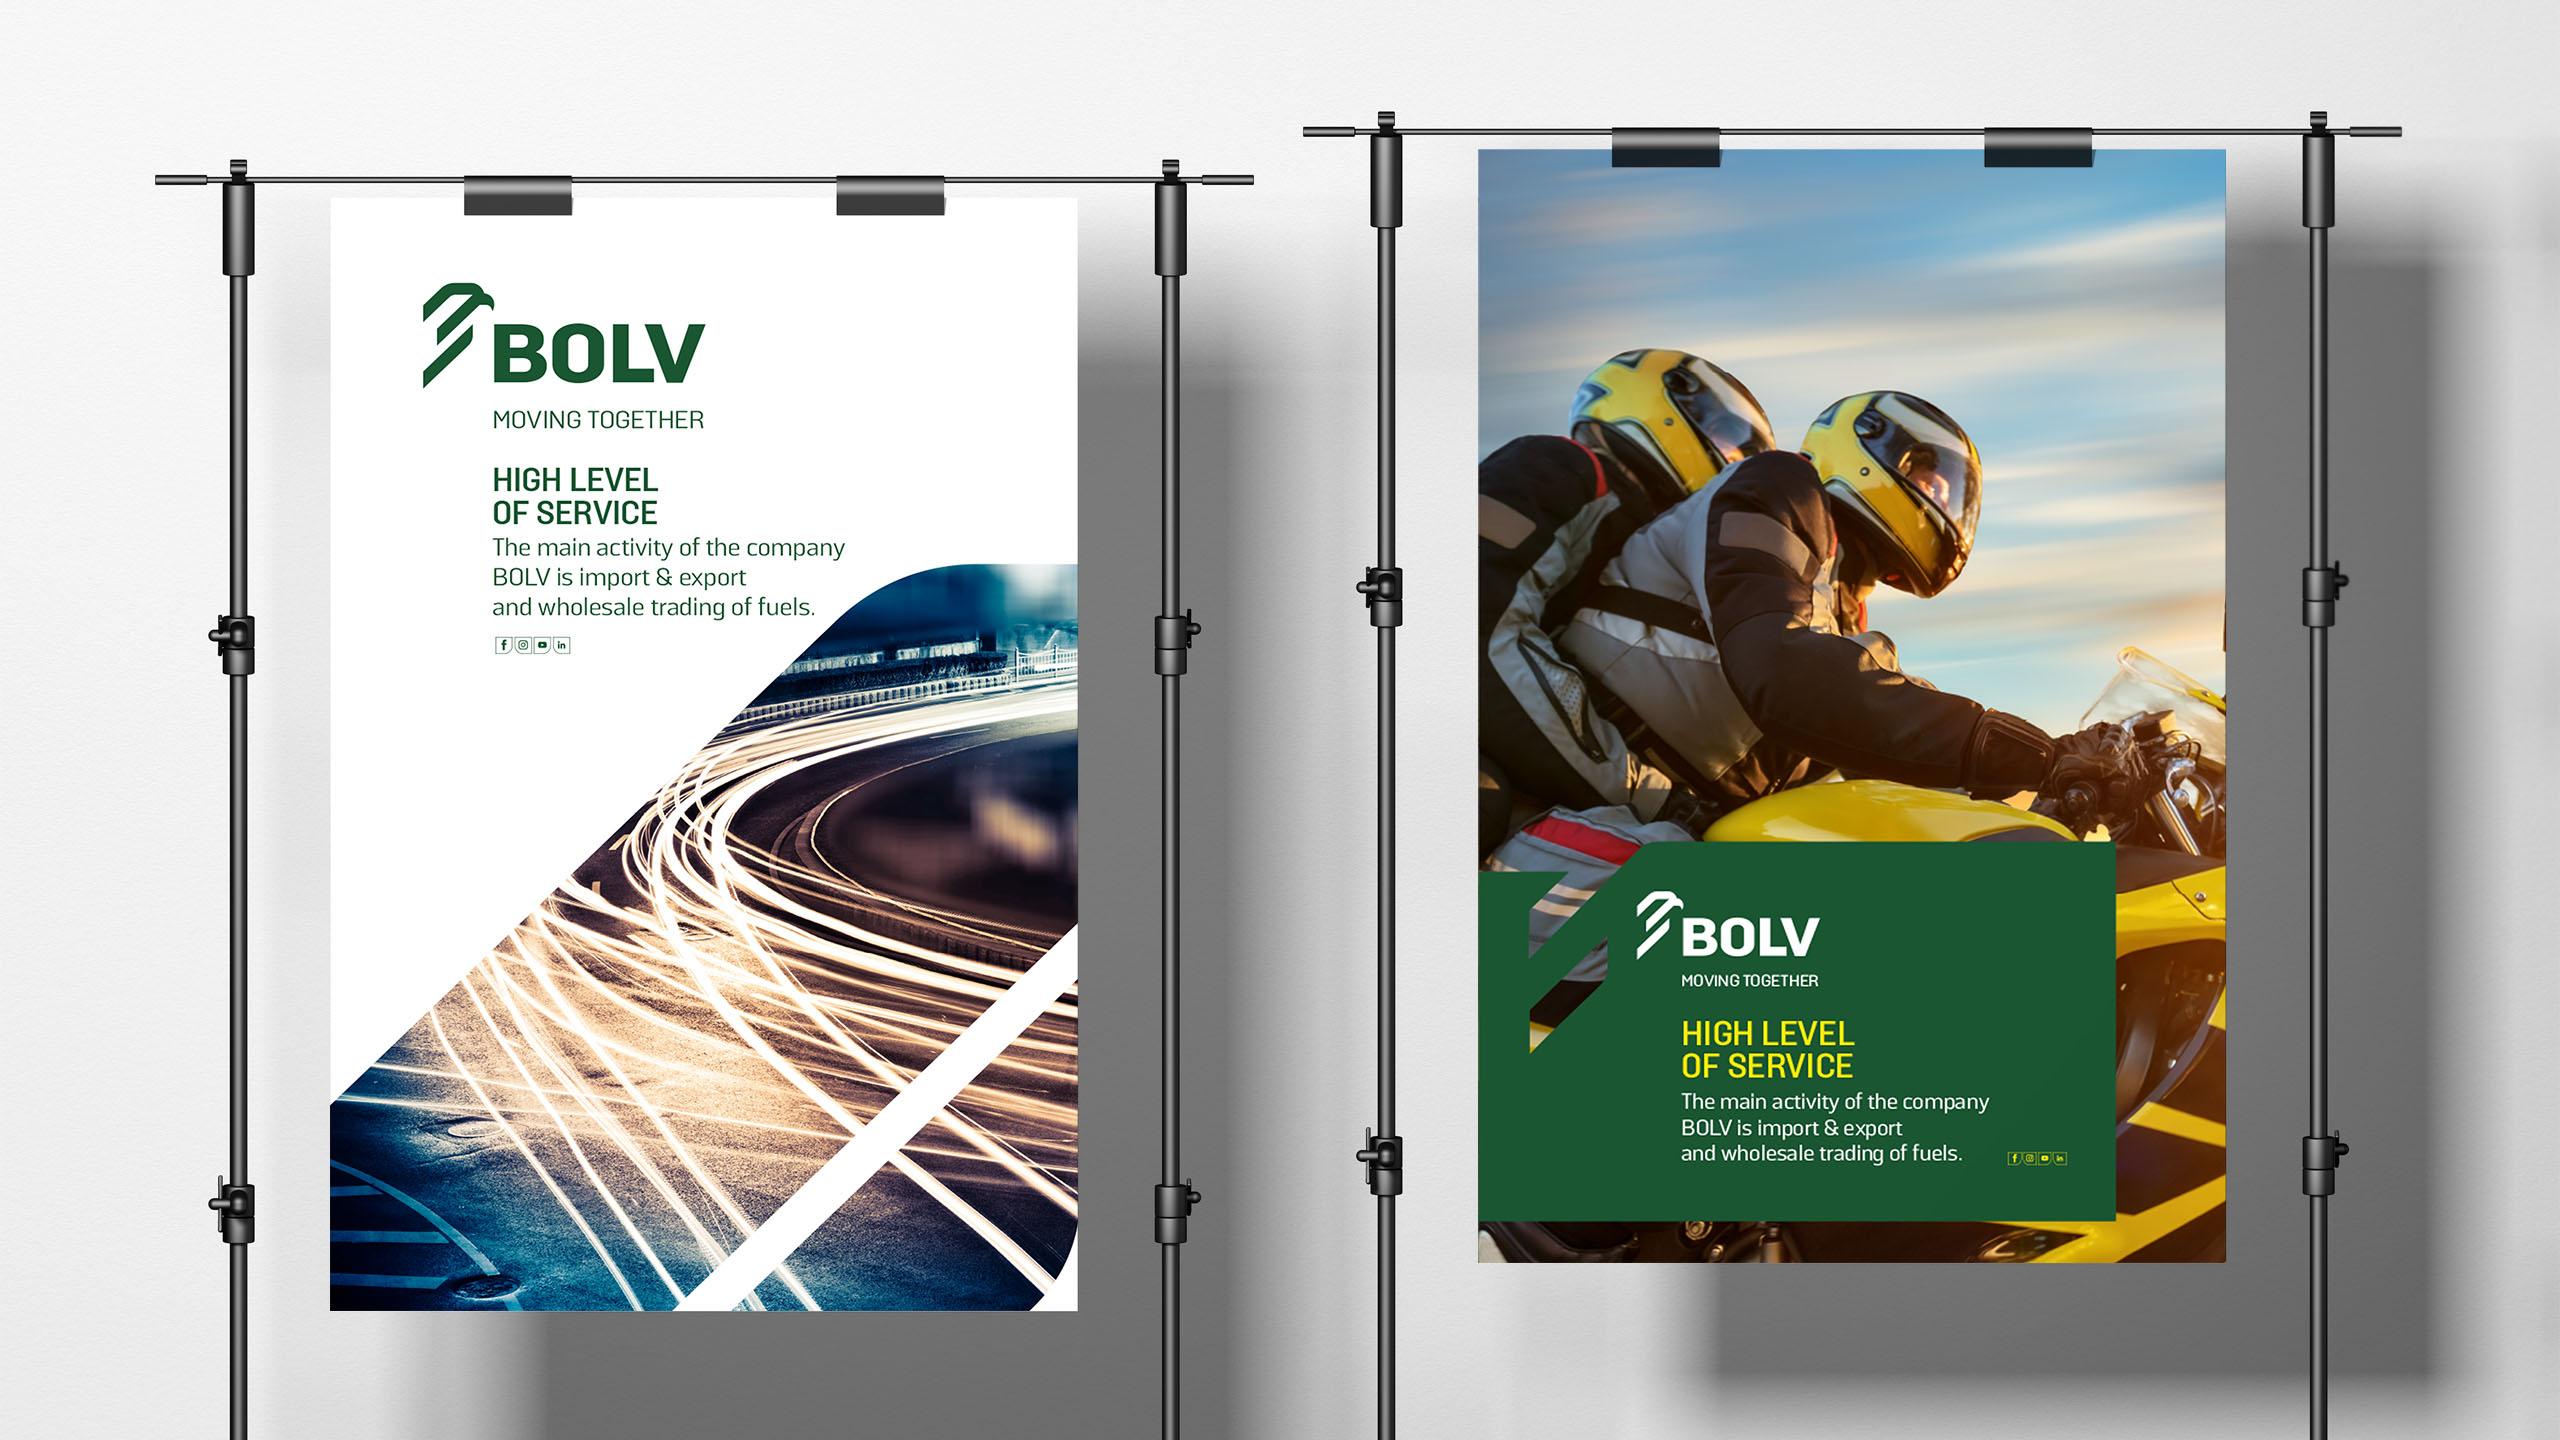 Bolv Group Project Img 8 - Vatra Agency / Founder & CEO Gerton Bejo